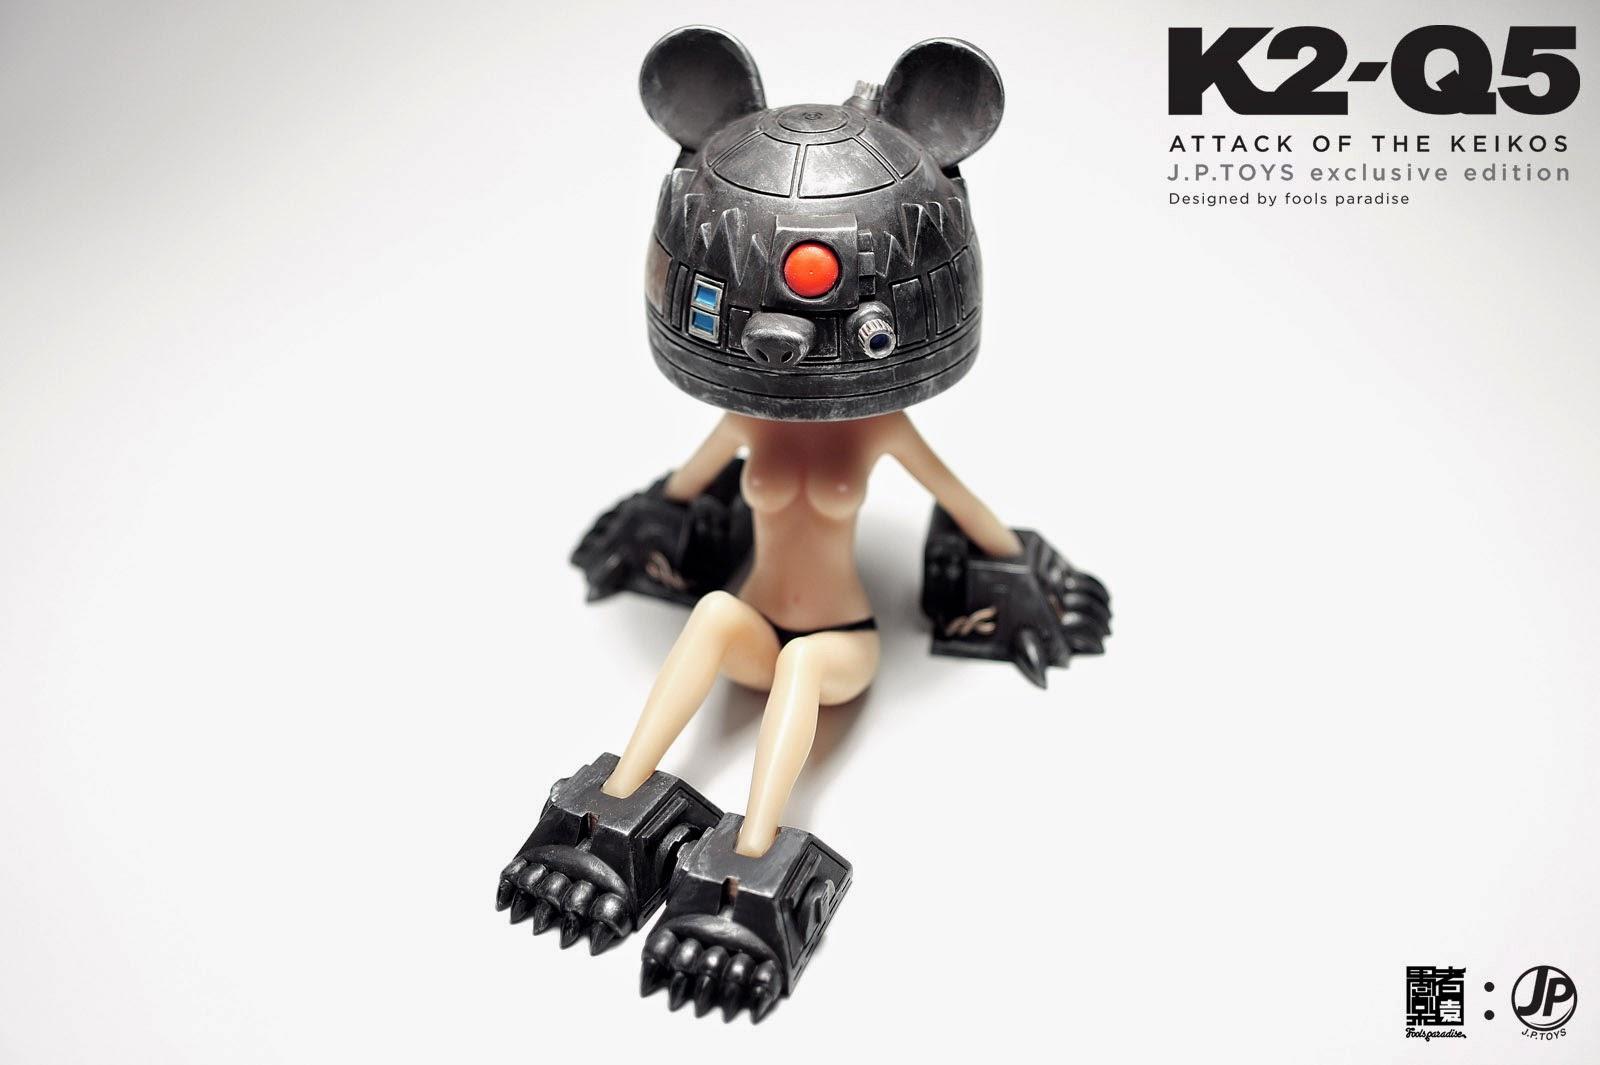 Keiko-DSC09324